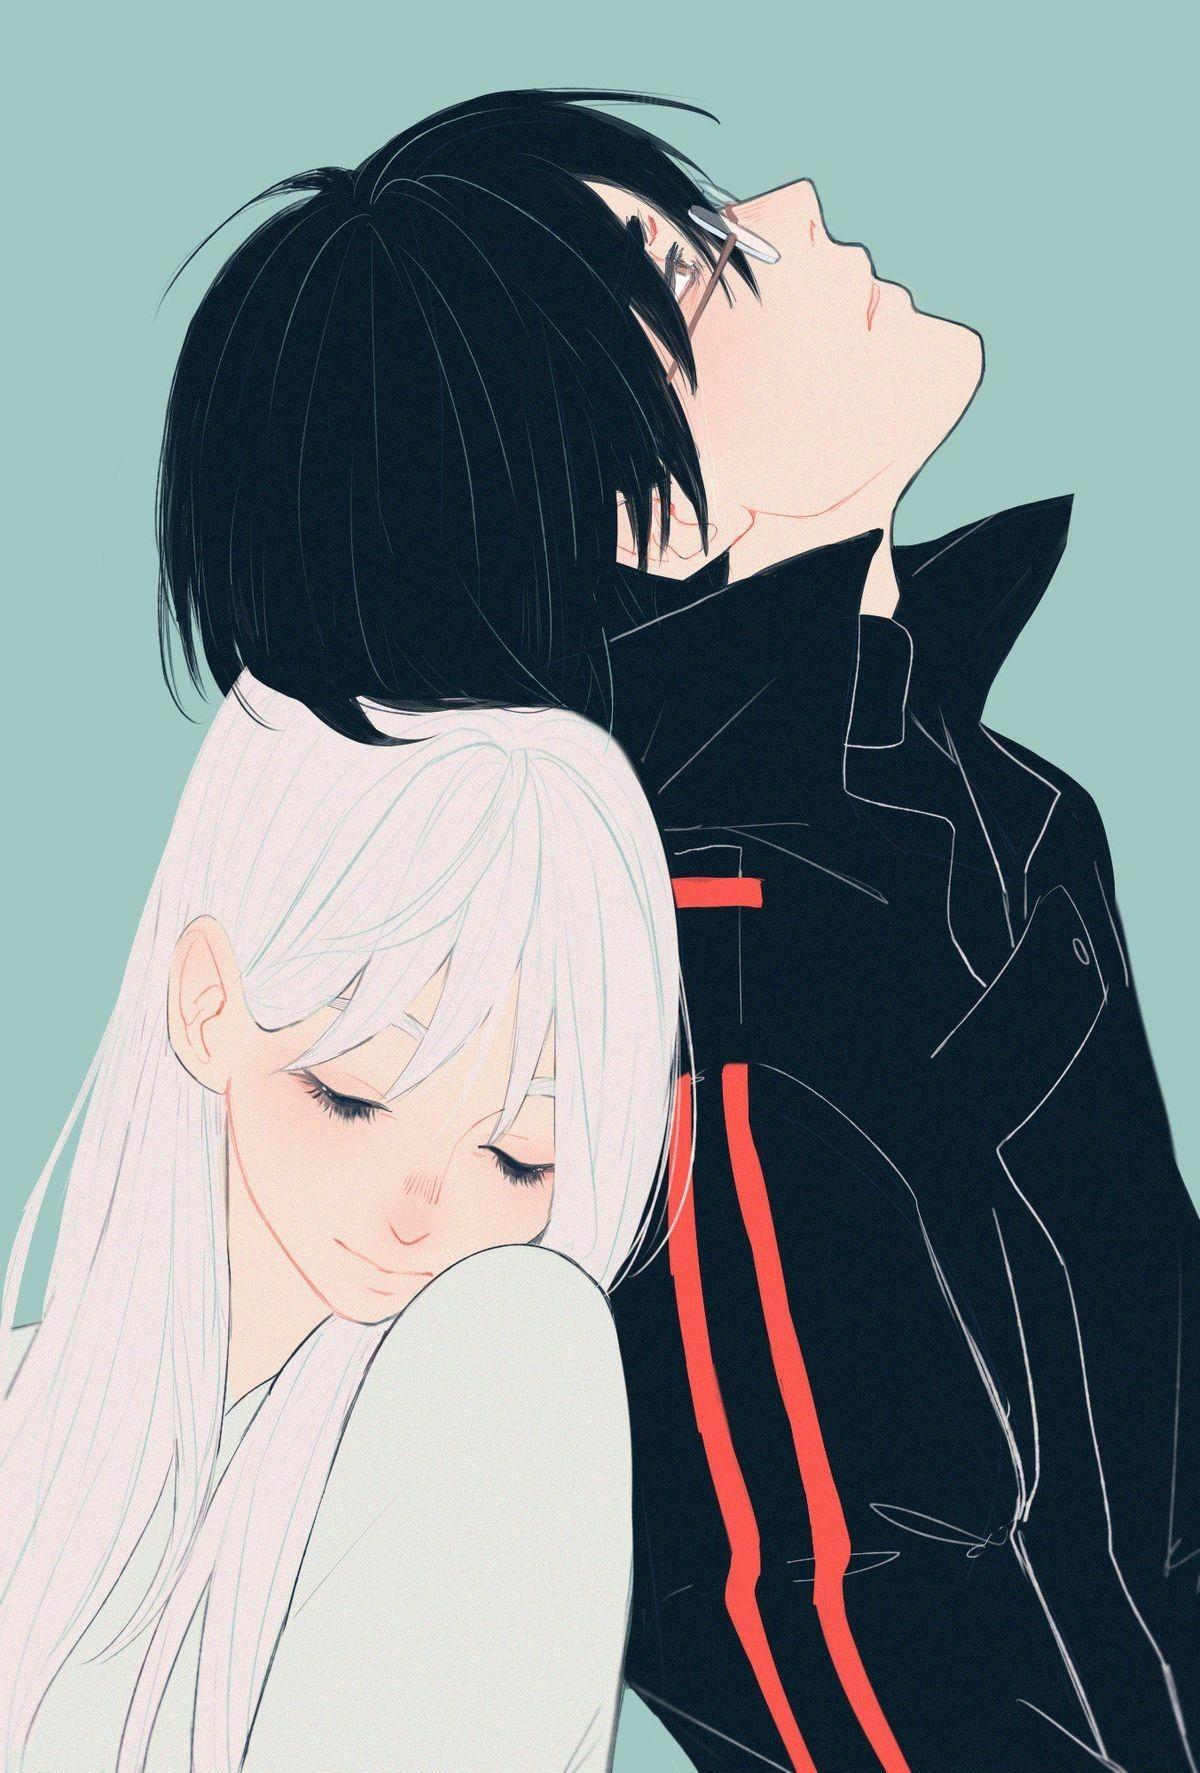 Cute Couple Digital Art Manga art, Anime art, Anime